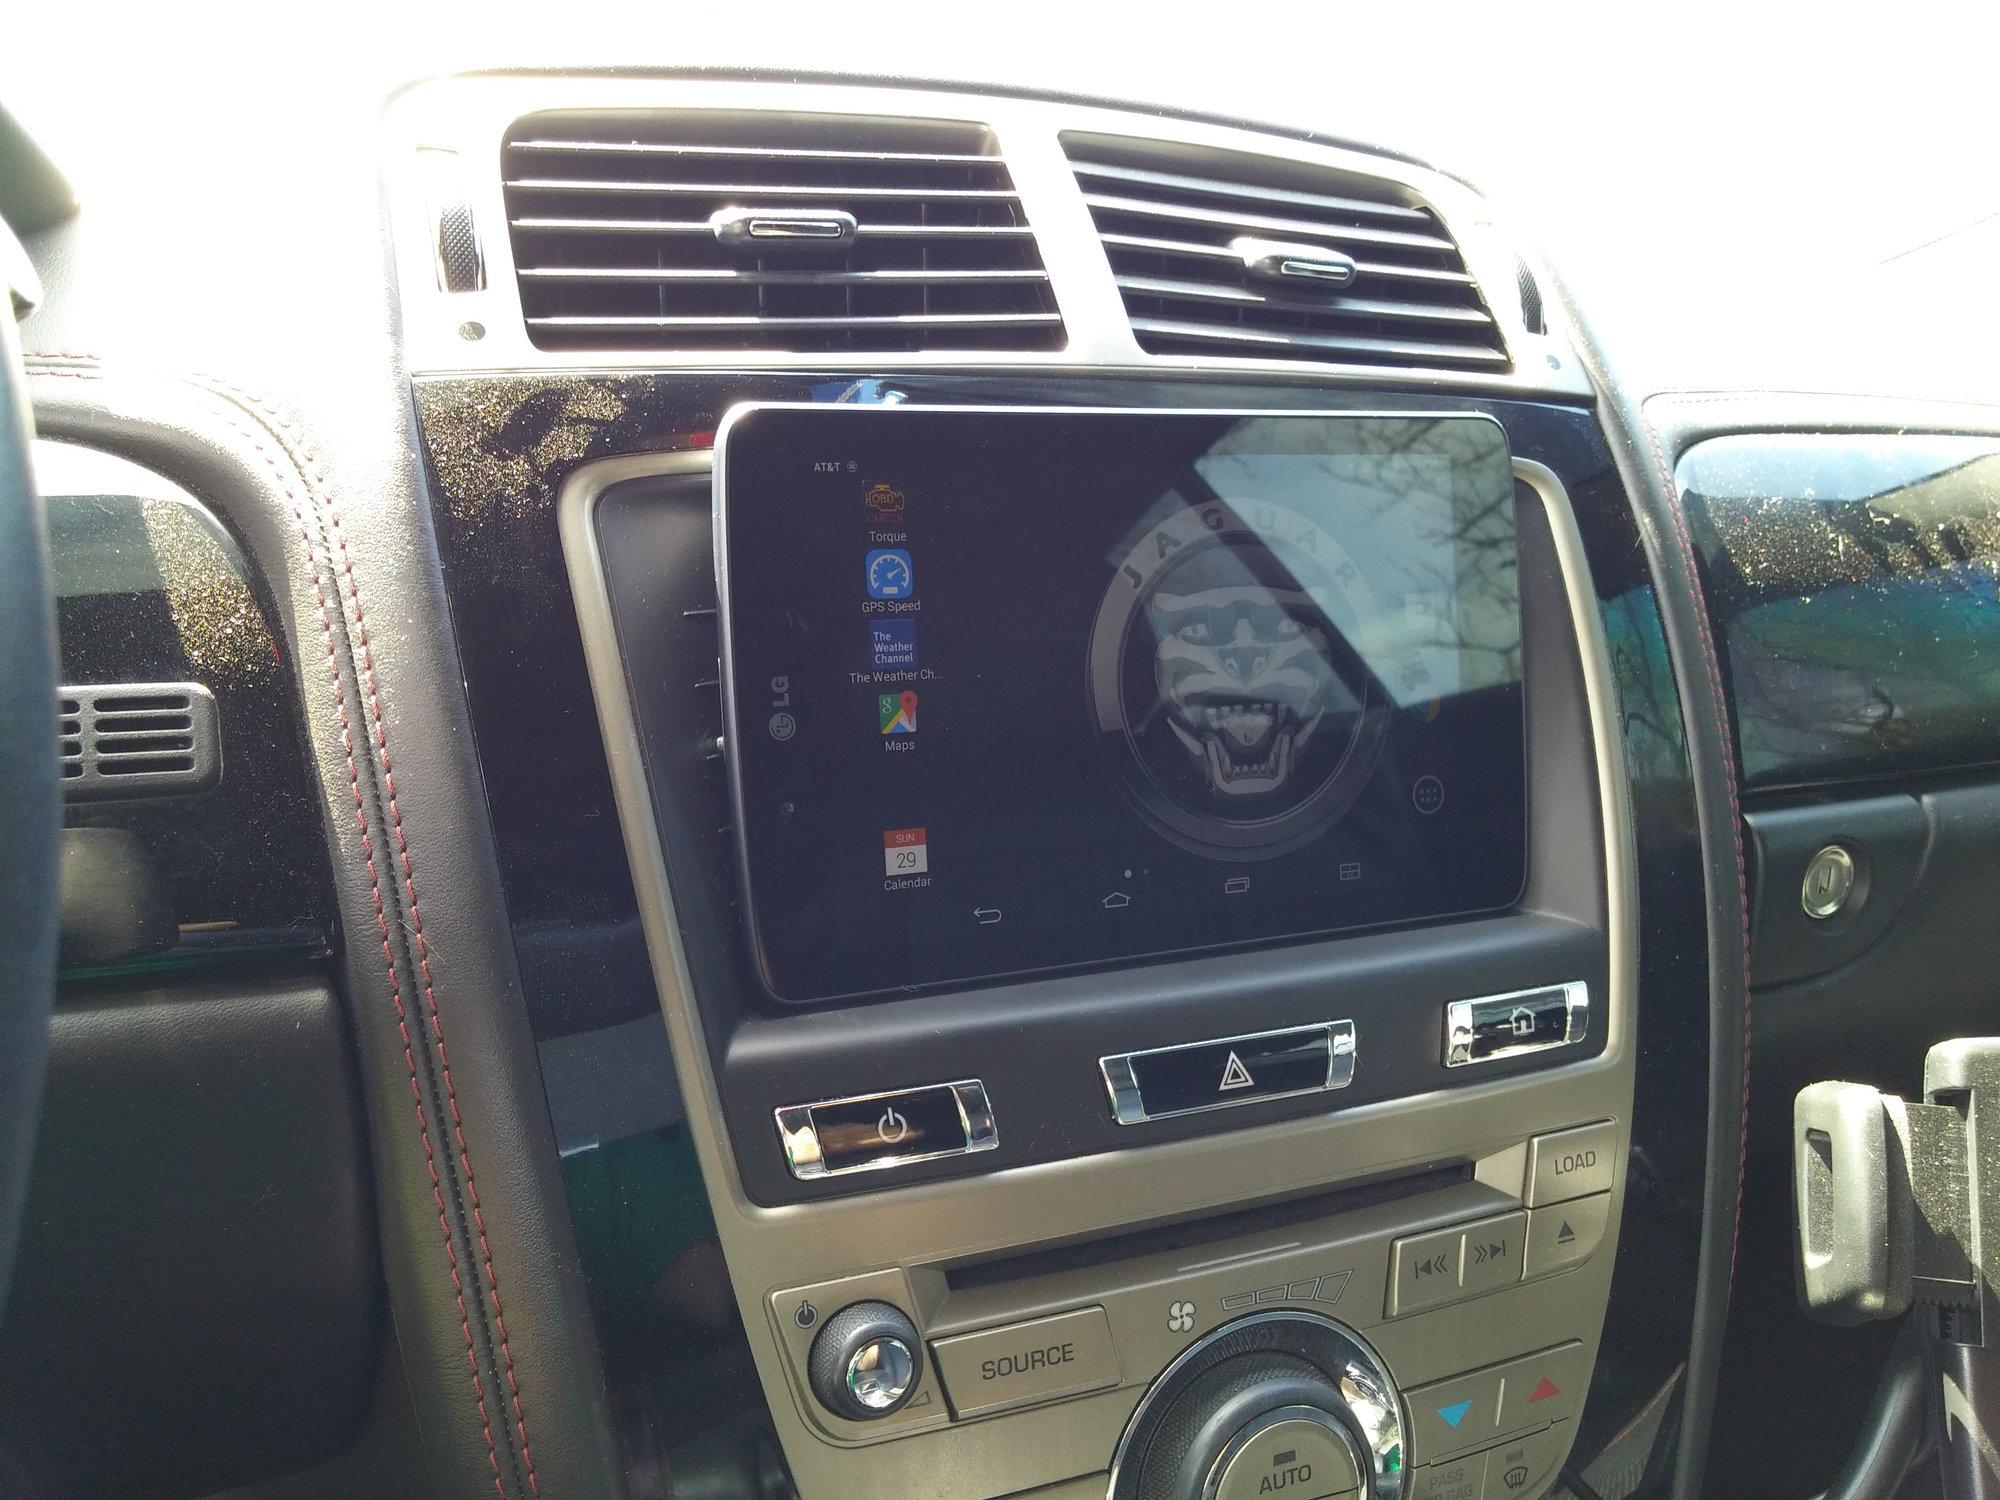 Mounting tablet to dash  - Jaguar Forums - Jaguar